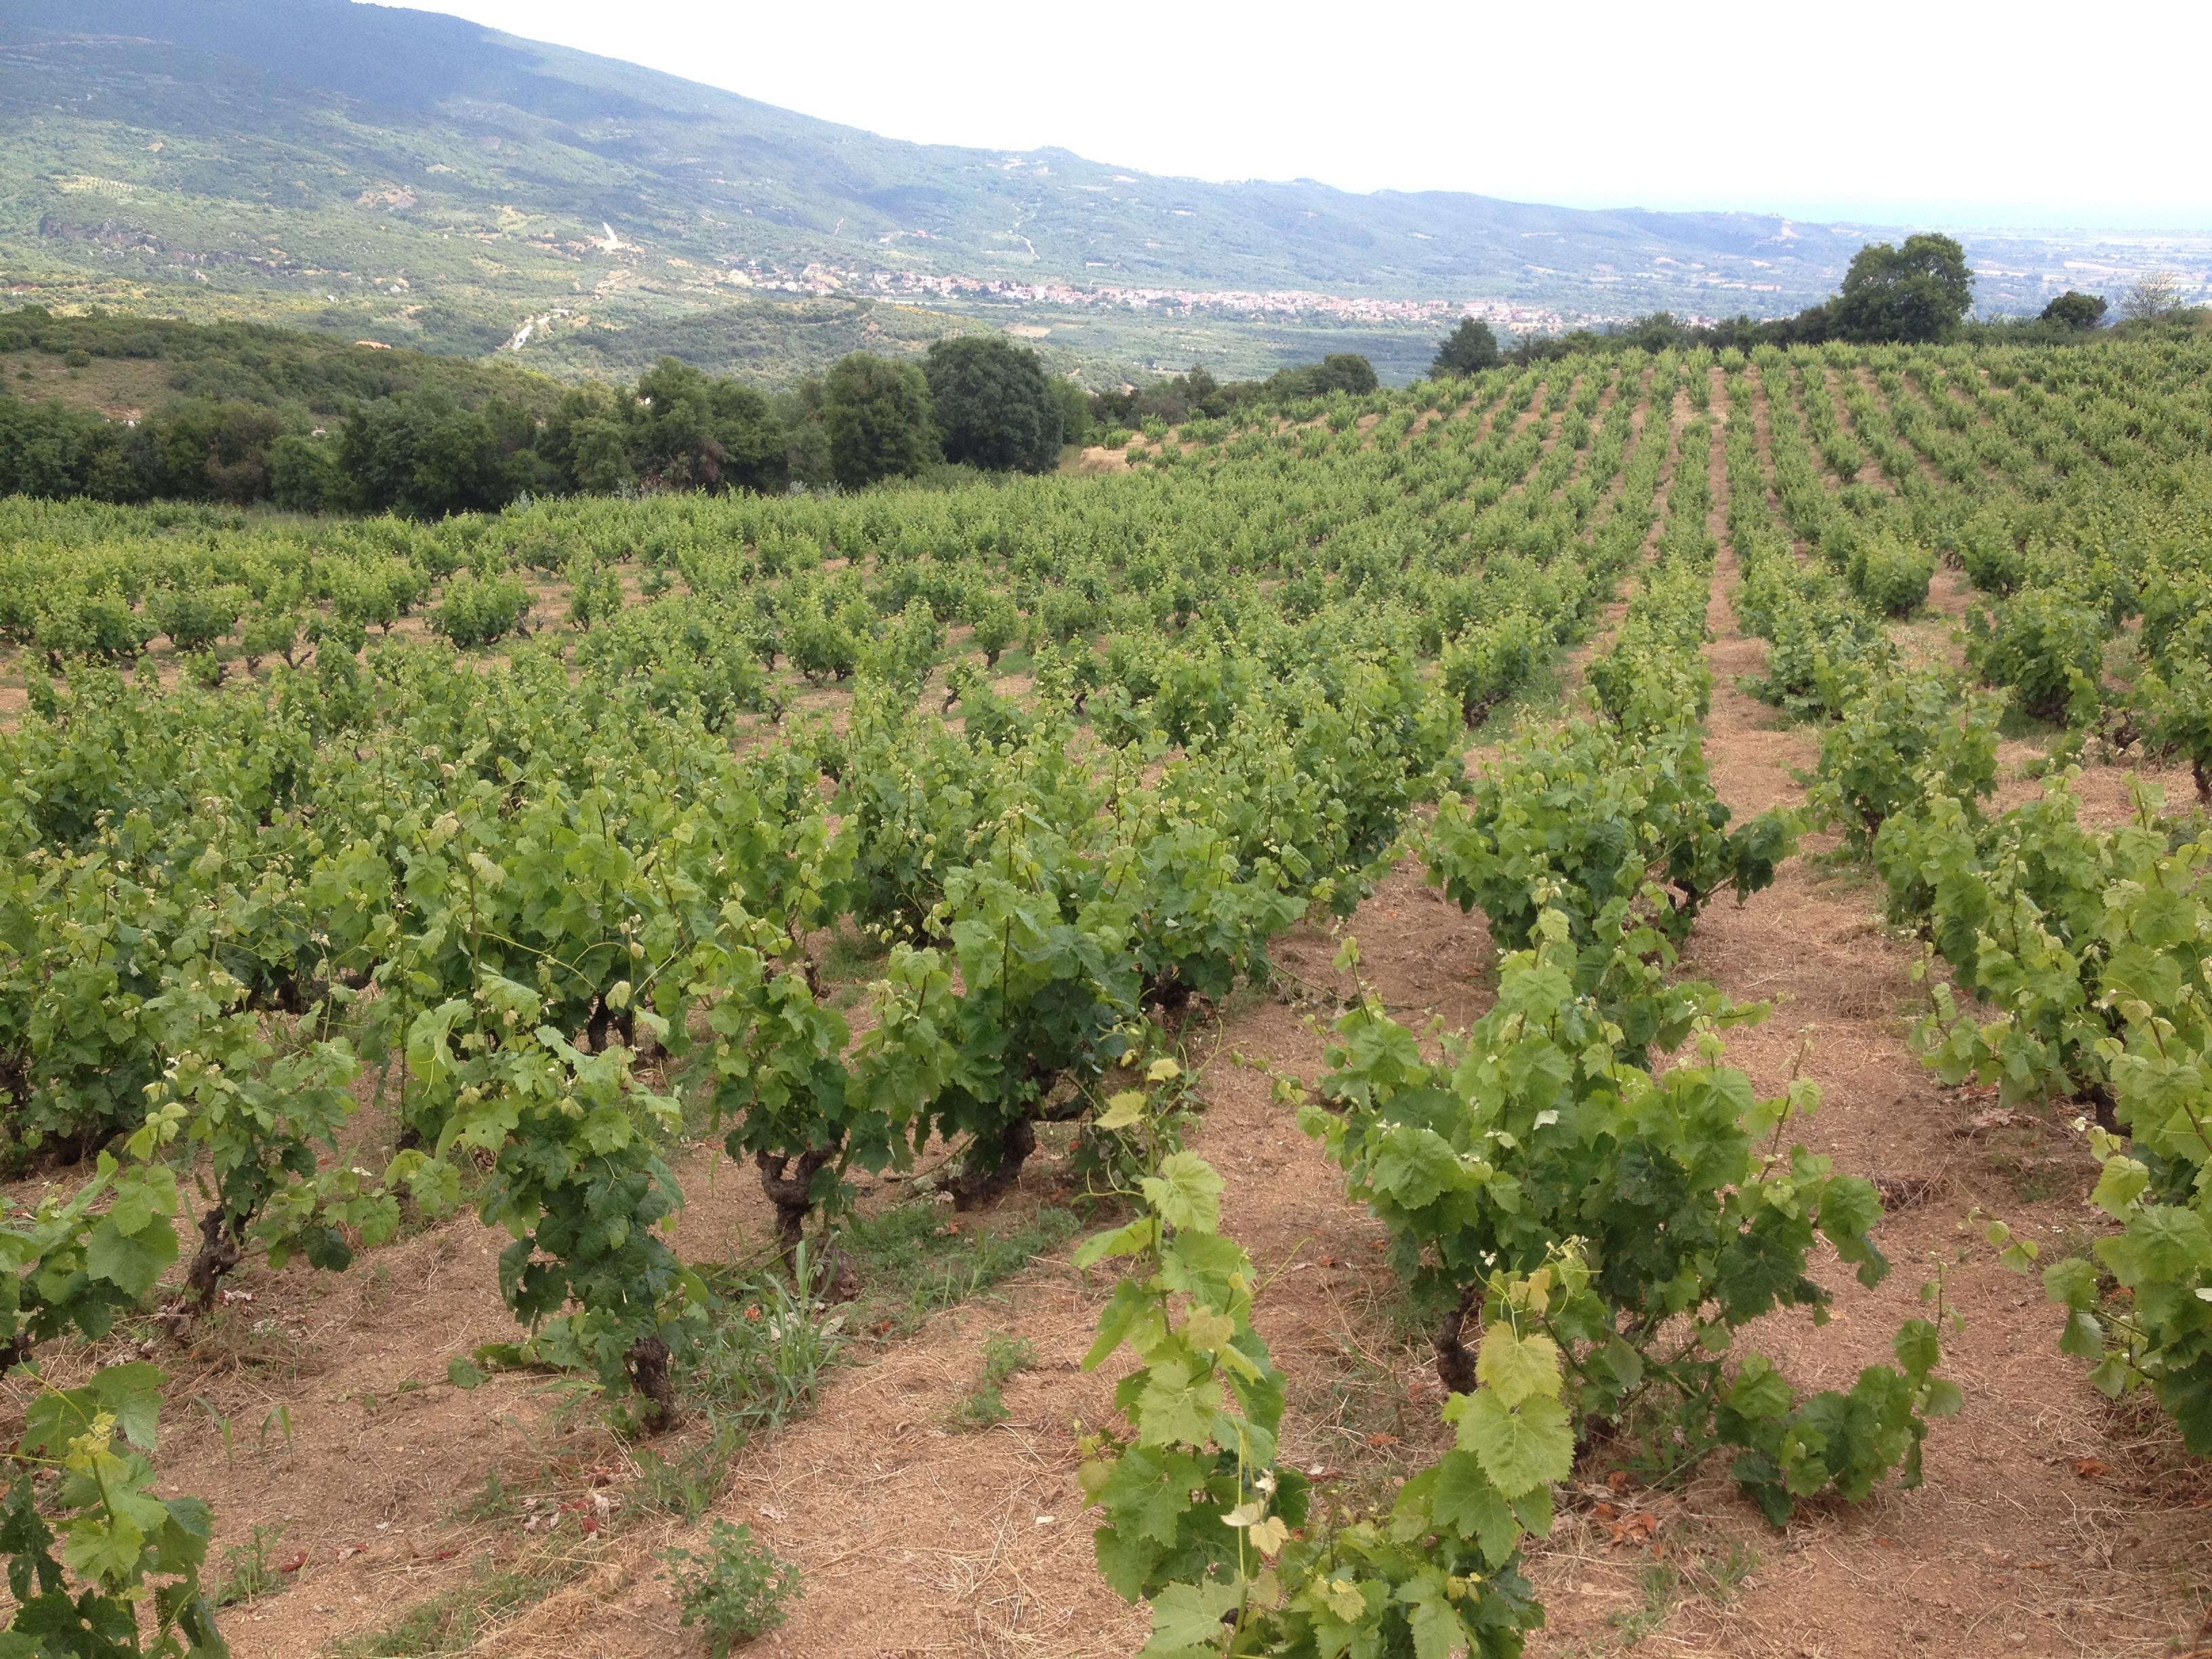 How Greece's Debt Crisis Is Impacting Its Wine Industry